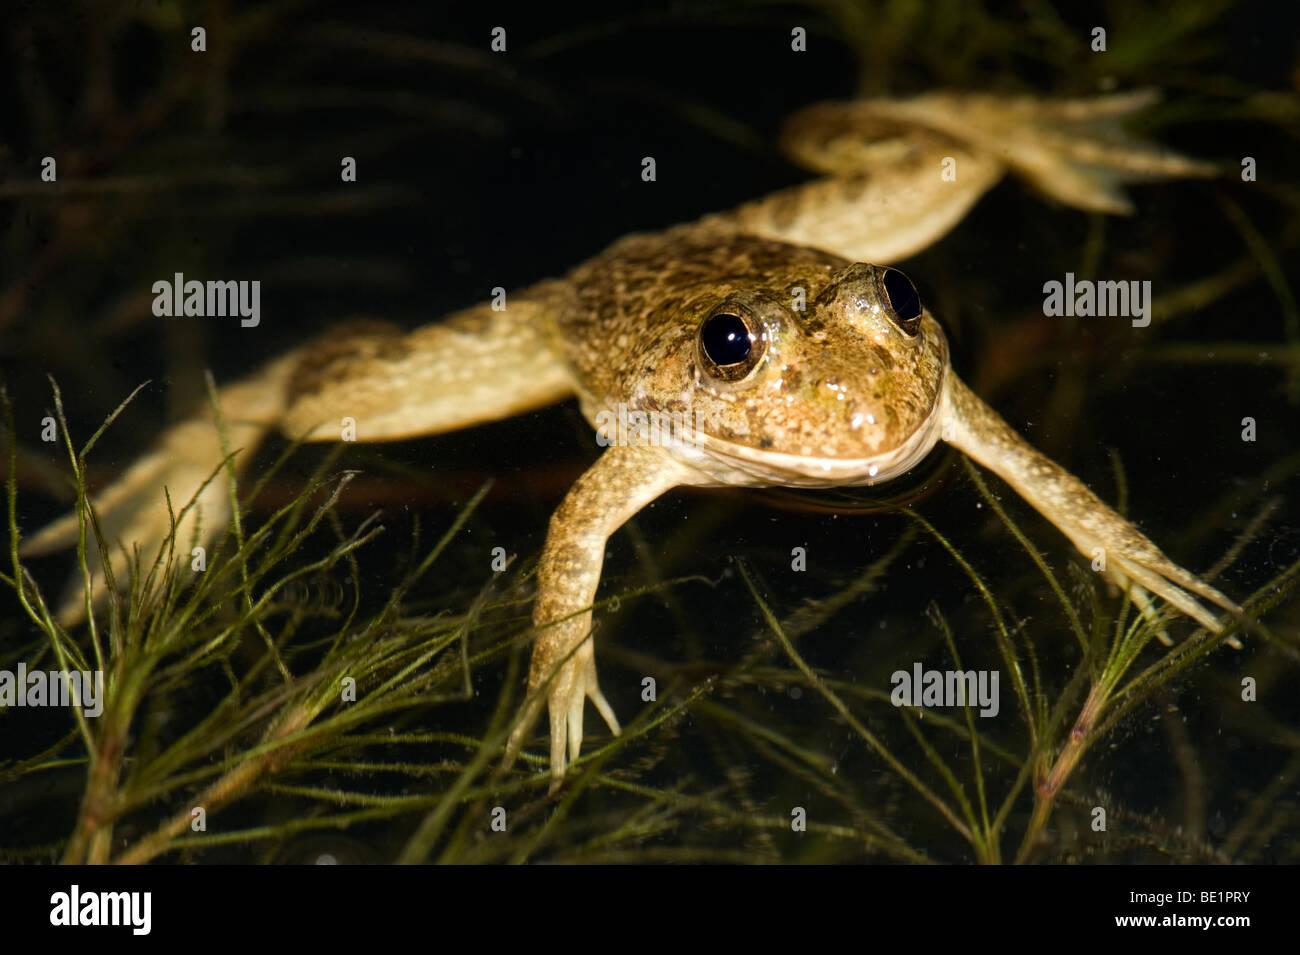 Frog laying in pond Tomopterna braviceps Bandhavgarh National Park - Stock Image